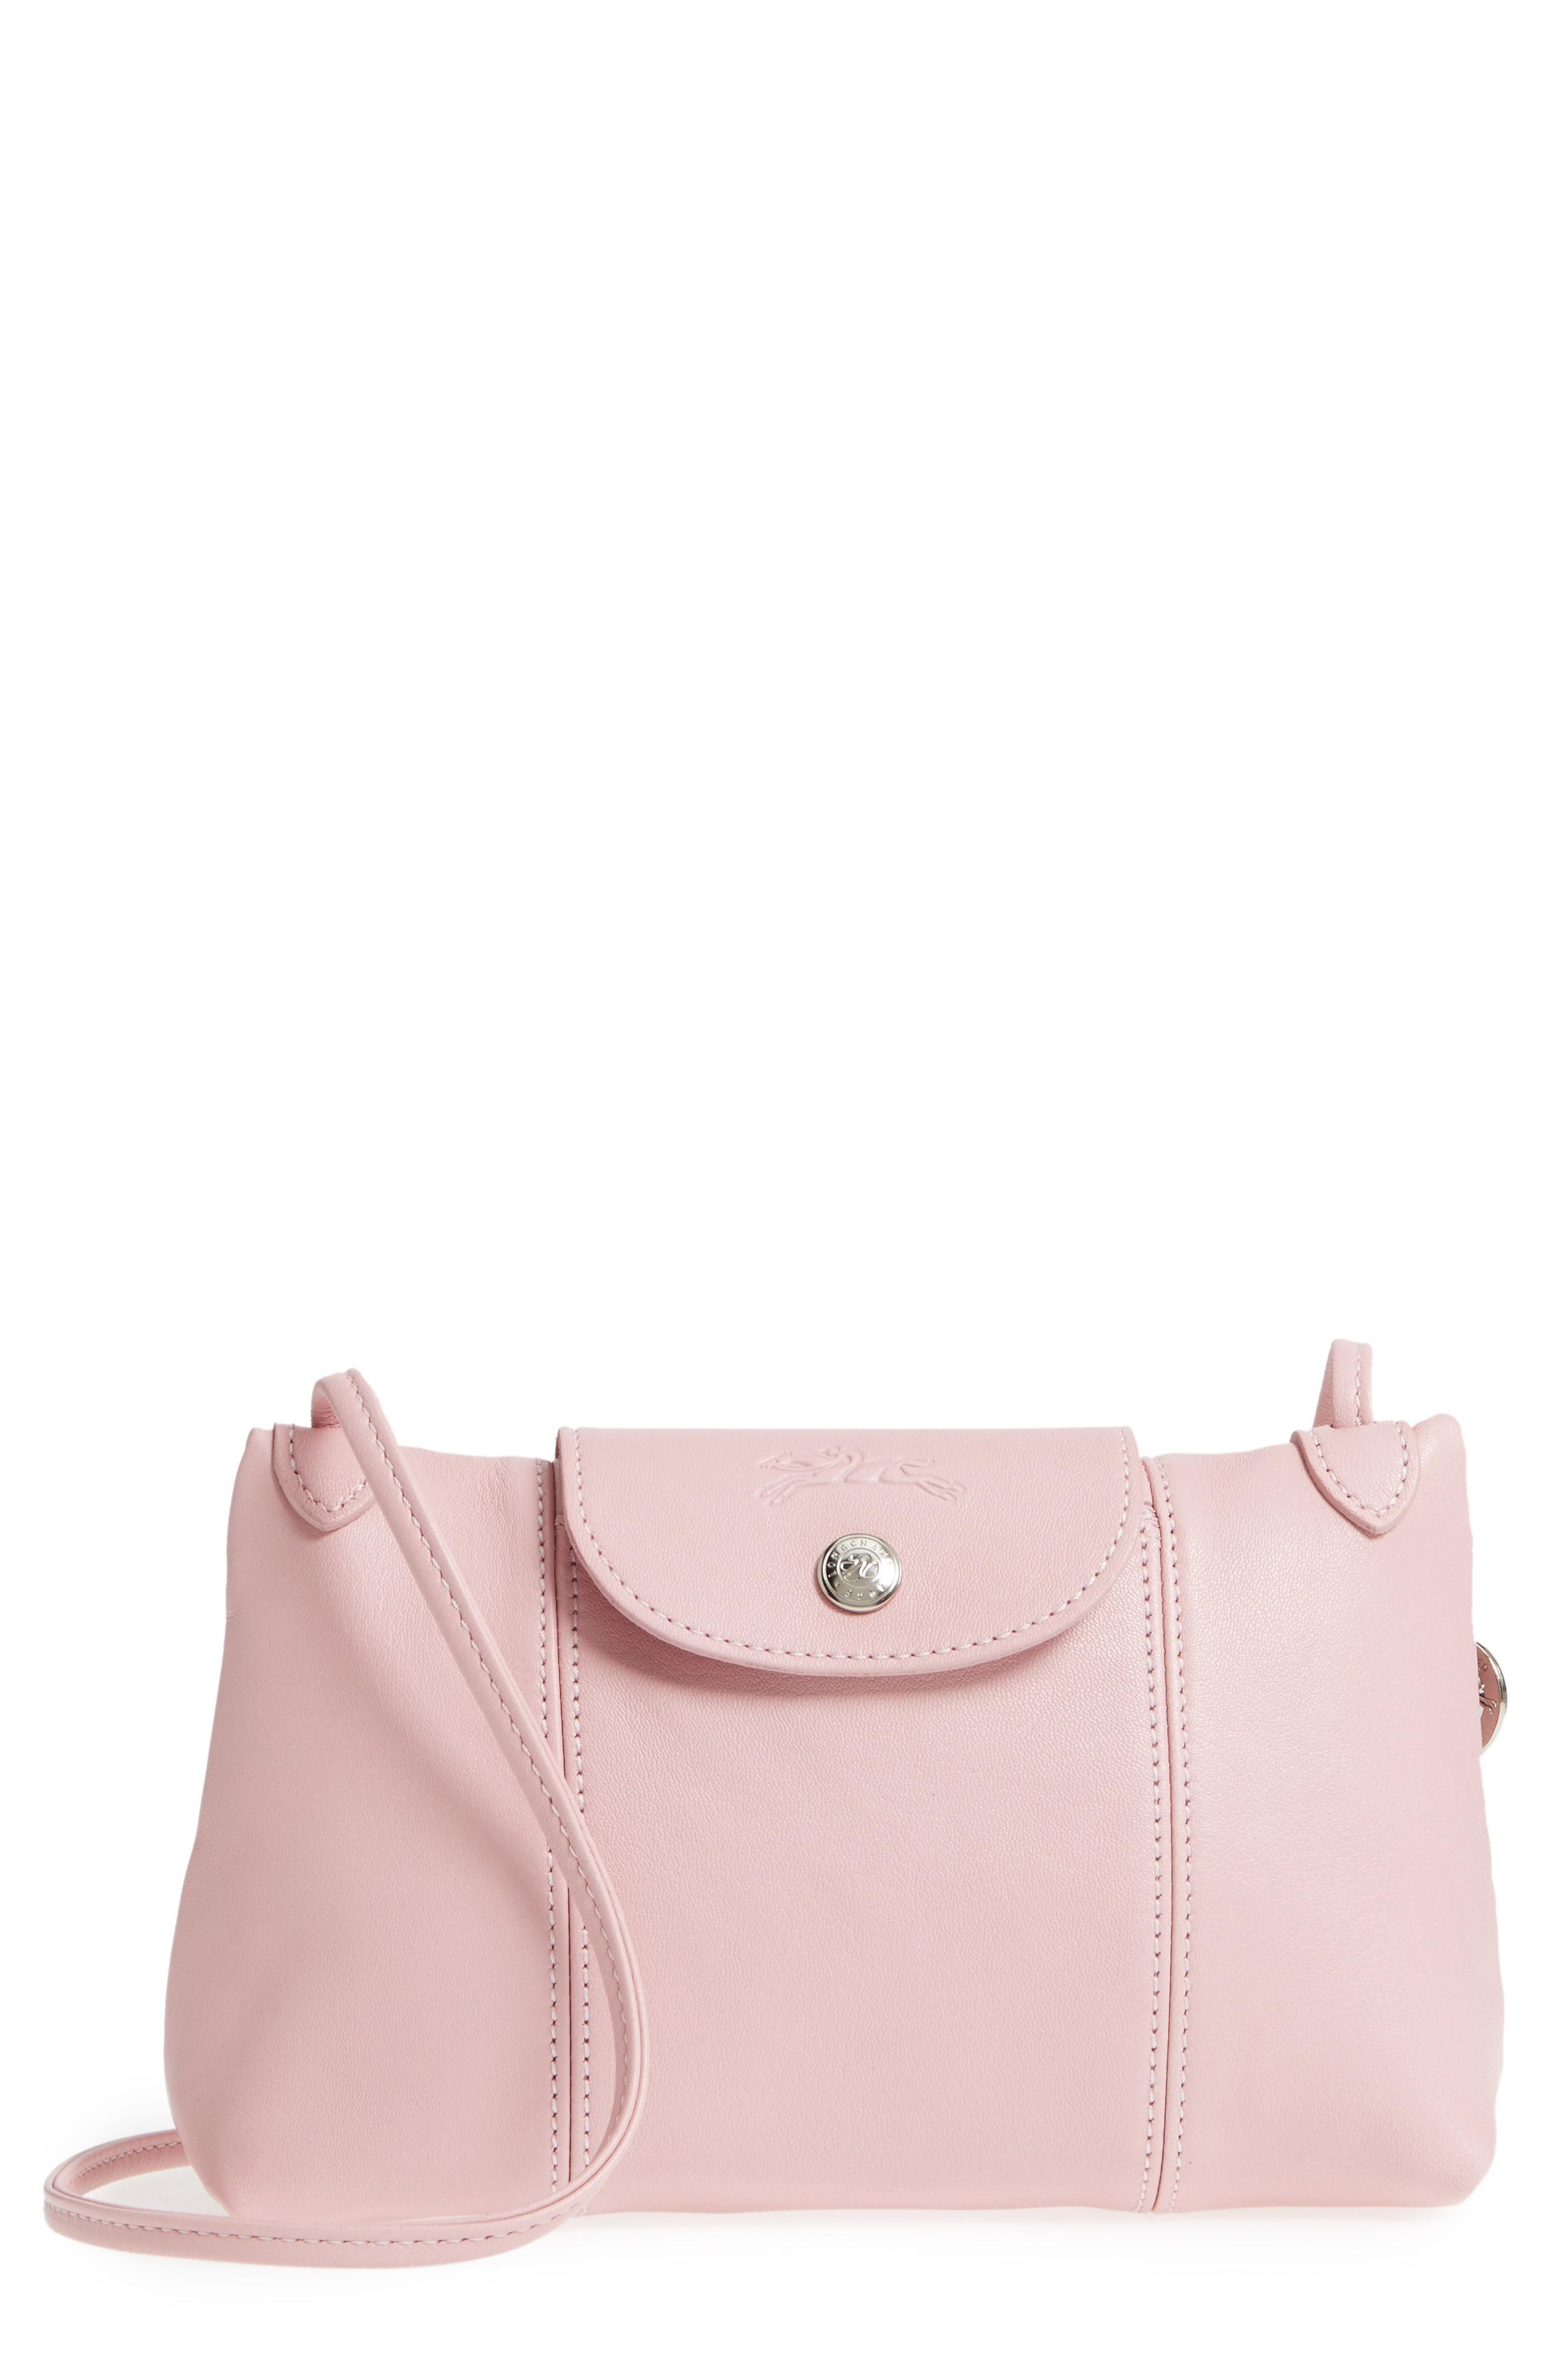 Le Pliage - Cuir Crossbody Bag - Pink In Girl